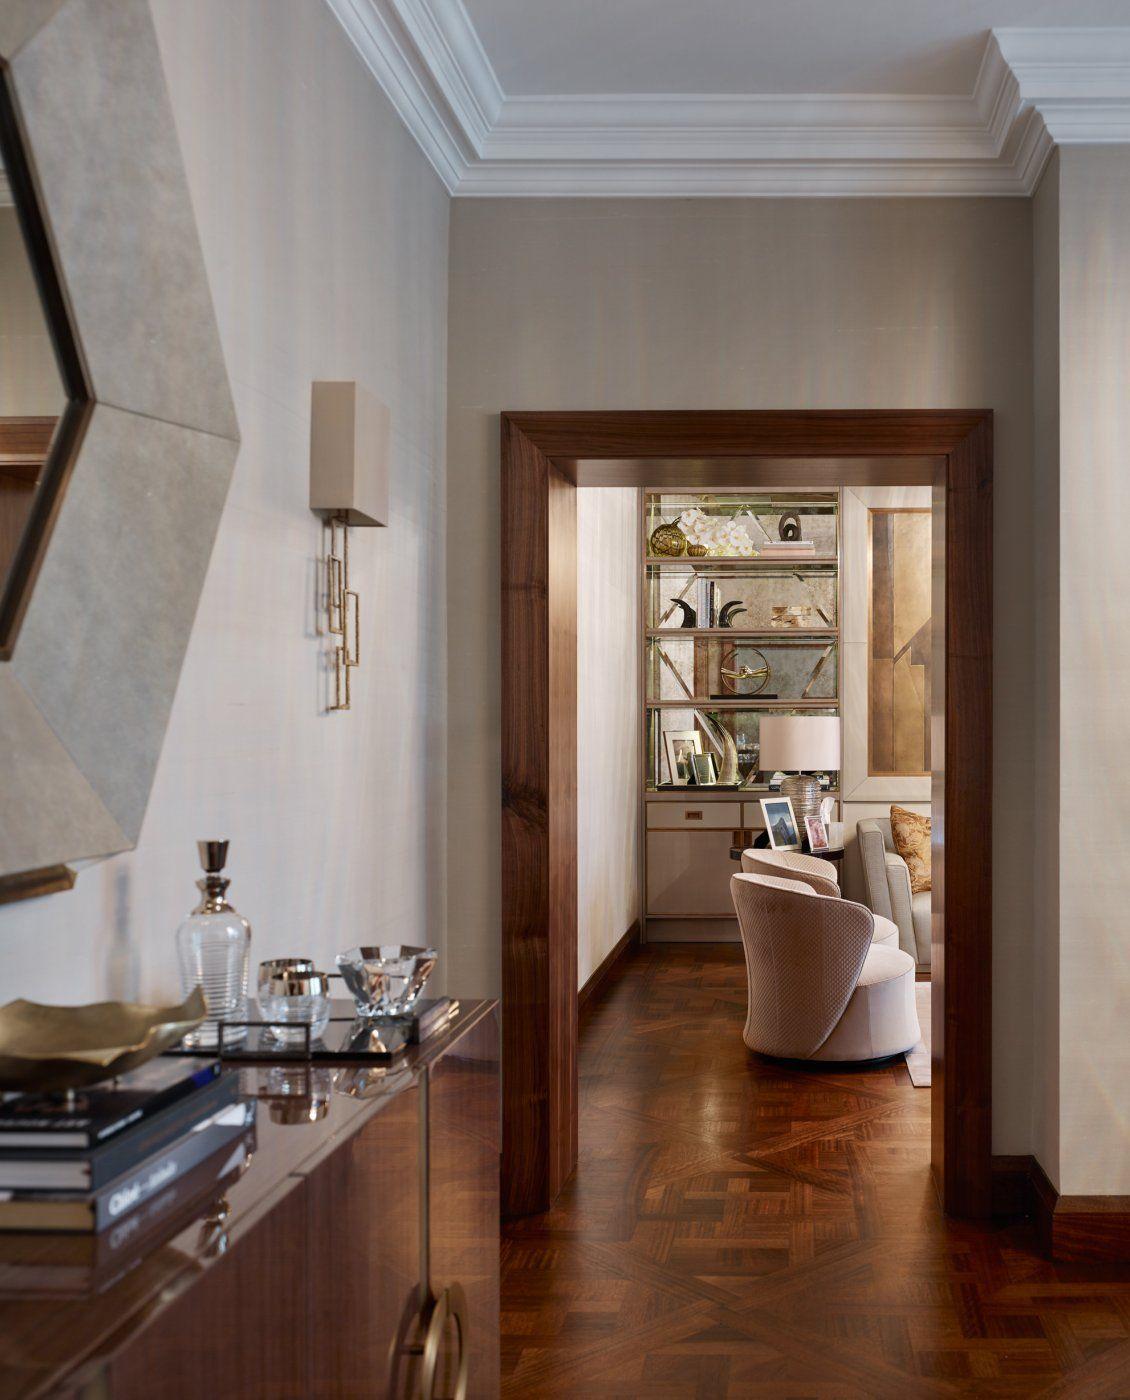 Luxury interior design of apartment in Bayswater